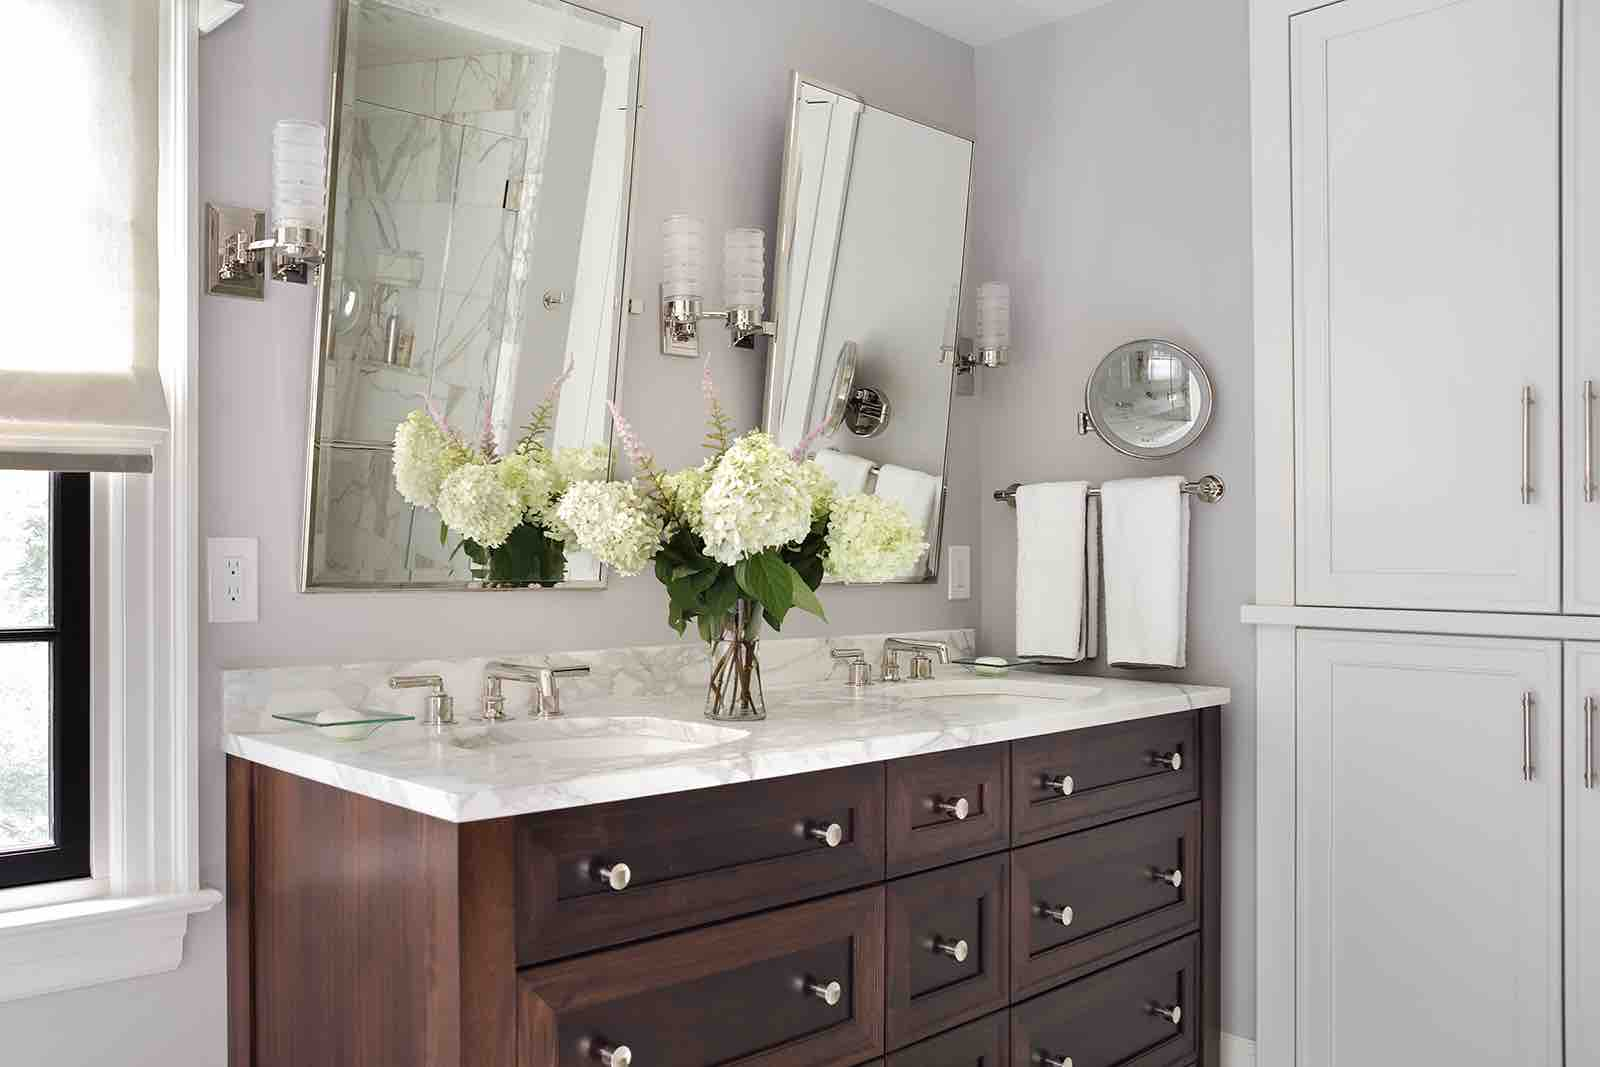 MASTER BEDROOM & BATH – Summit, NJ Home Renovation